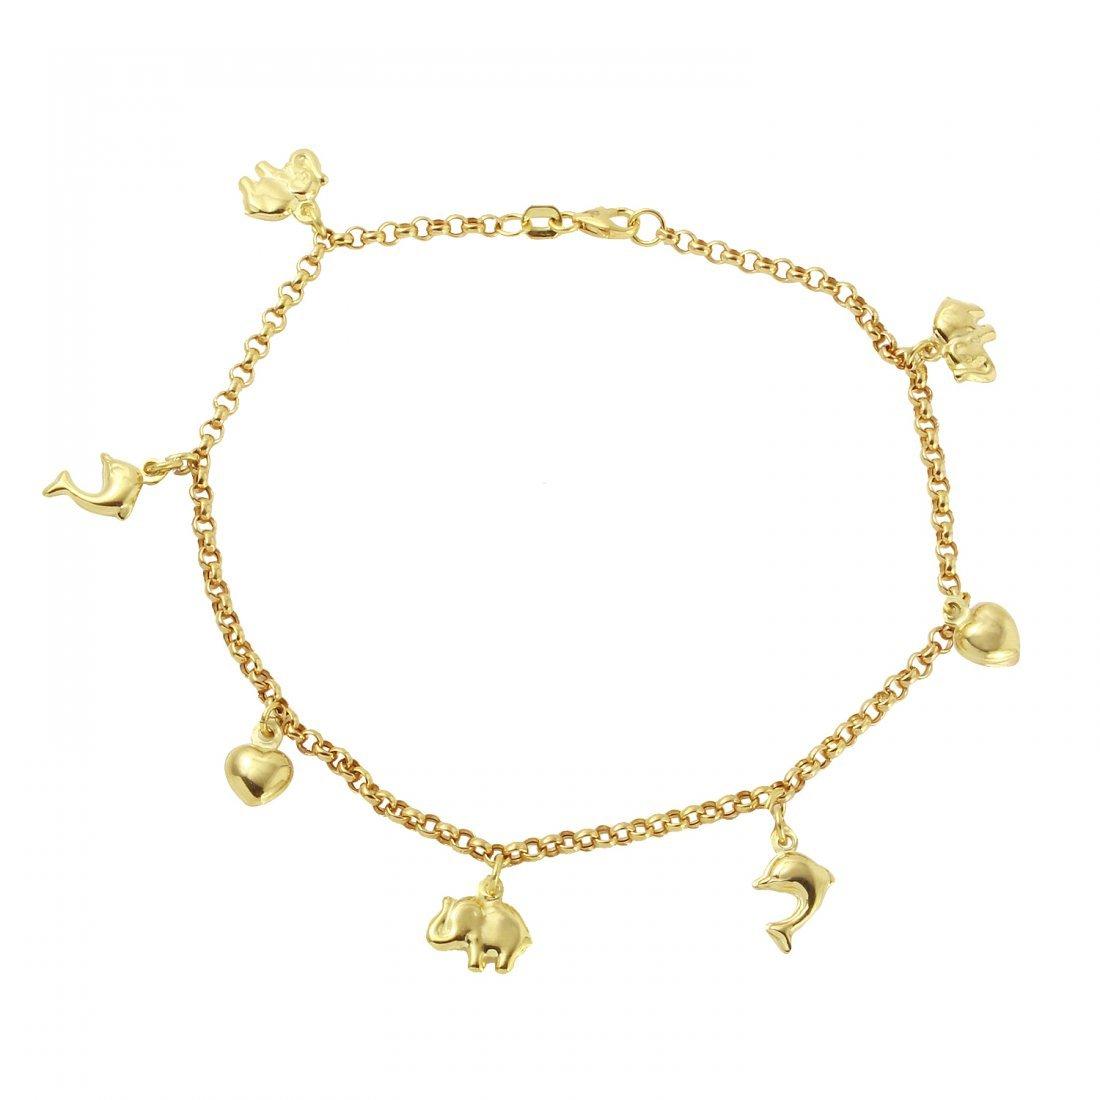 Ladies 10k Yellow Gold Bracelet